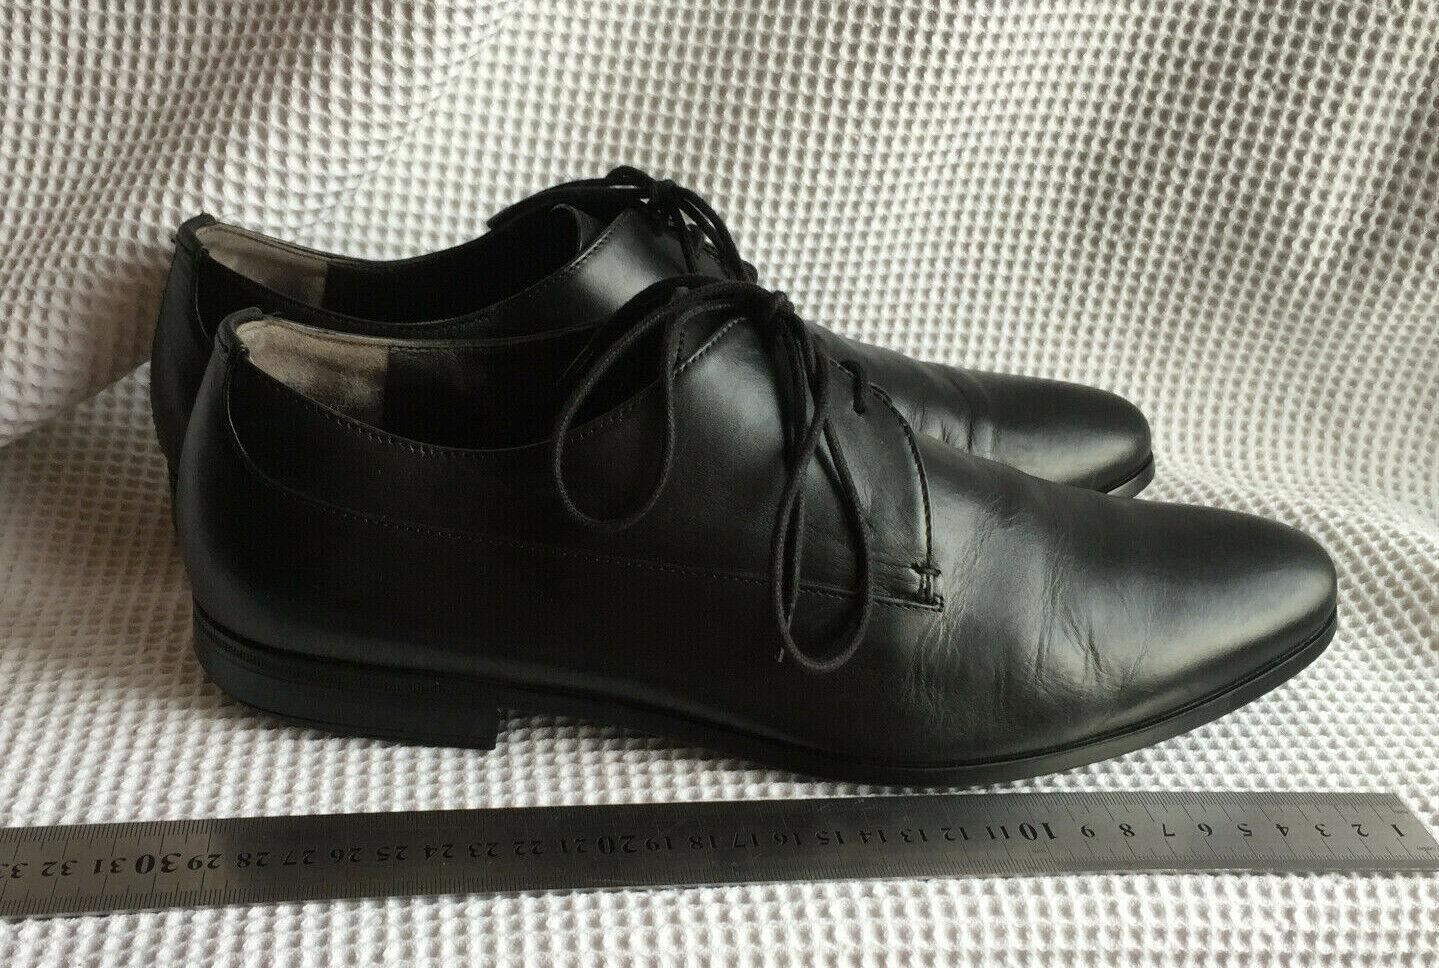 Fratelli Rossetti One shoes  black leather men's shoe size UK 8 EU 42 USA 9  480